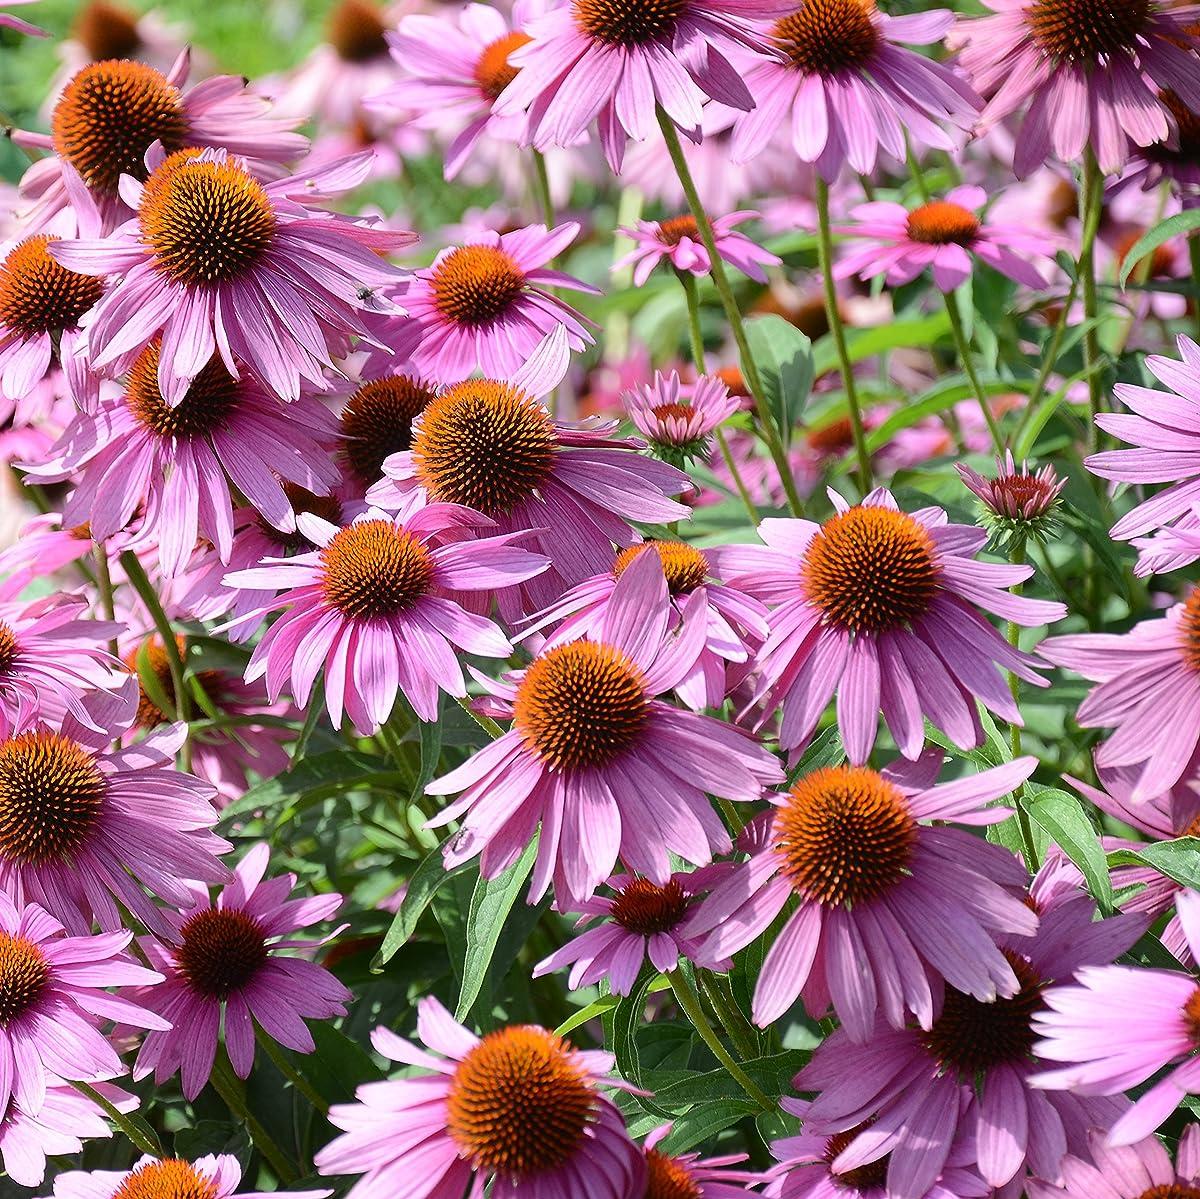 Outsidepride Echinacea Purple Coneflower Flower Seeds - 1000 Seeds